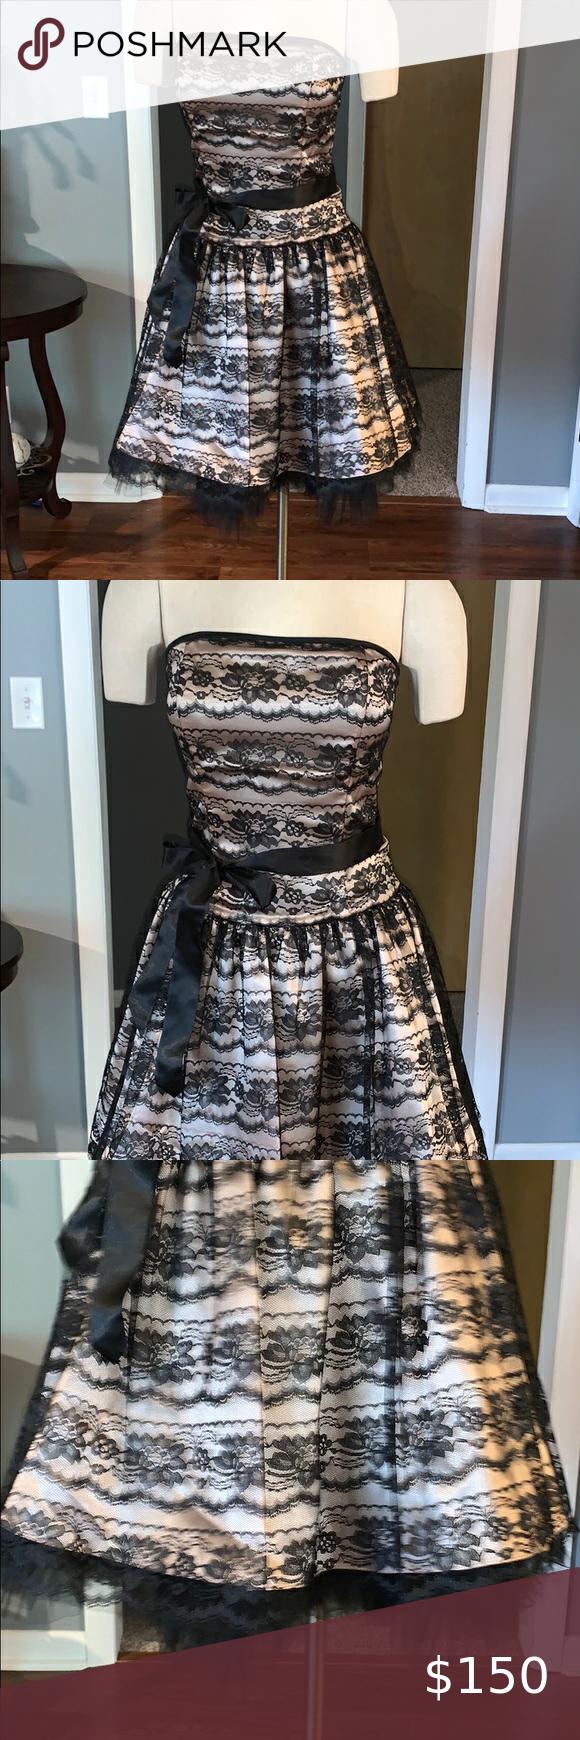 Gunne Sax Formal Black And Cream Lace Dress Cream Lace Dress Lace Dress White Lace Maxi Dress [ 1740 x 580 Pixel ]